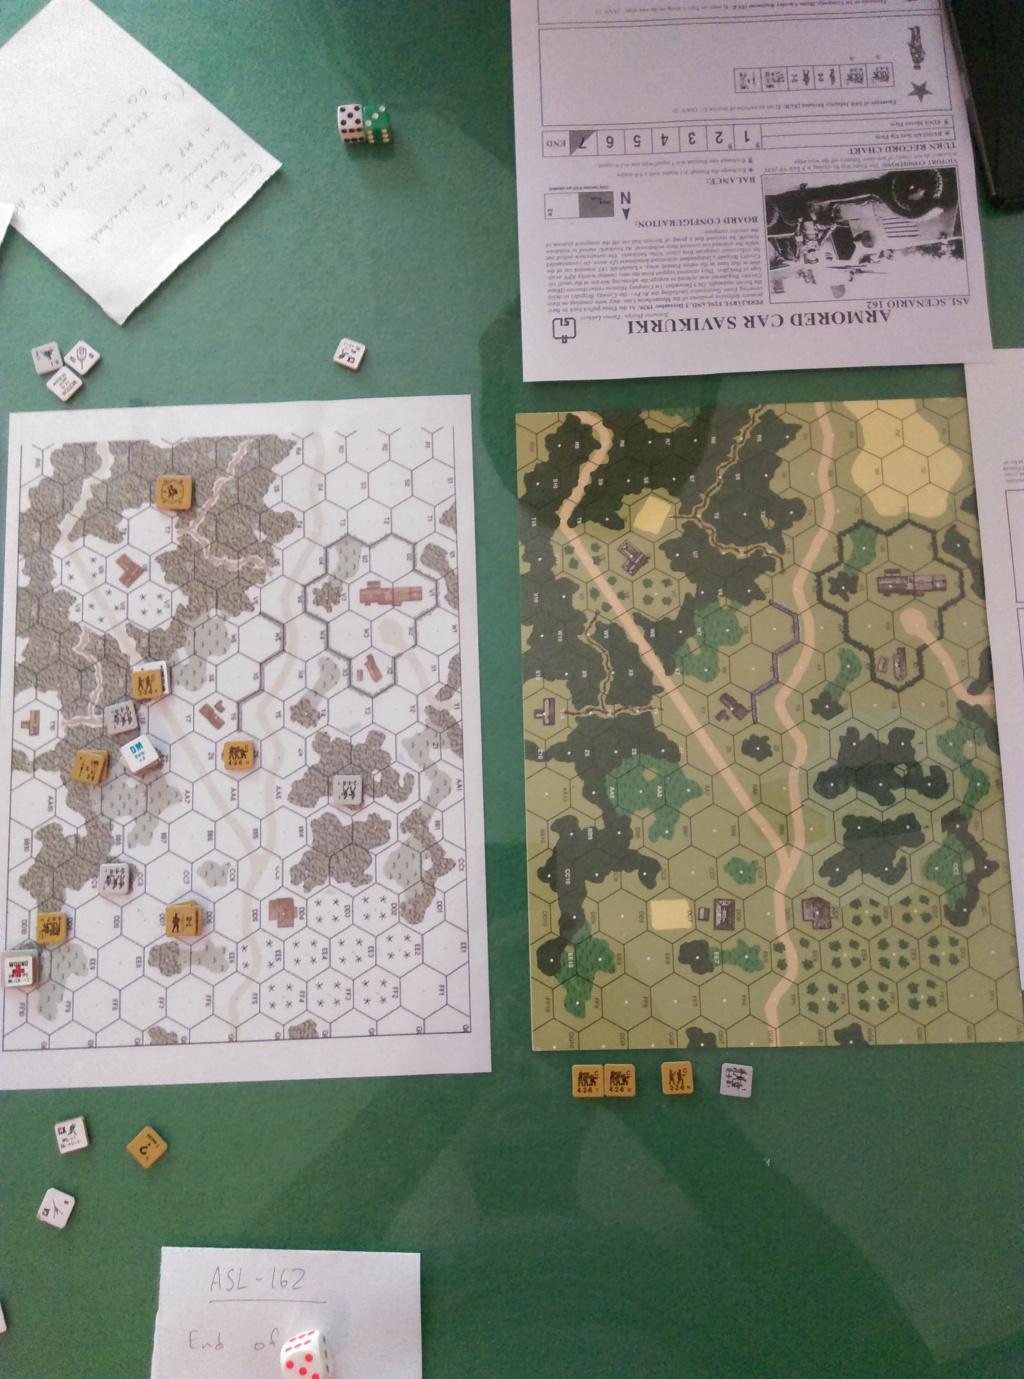 AFV training in Wugu. (John vs Roy) Asl-1613